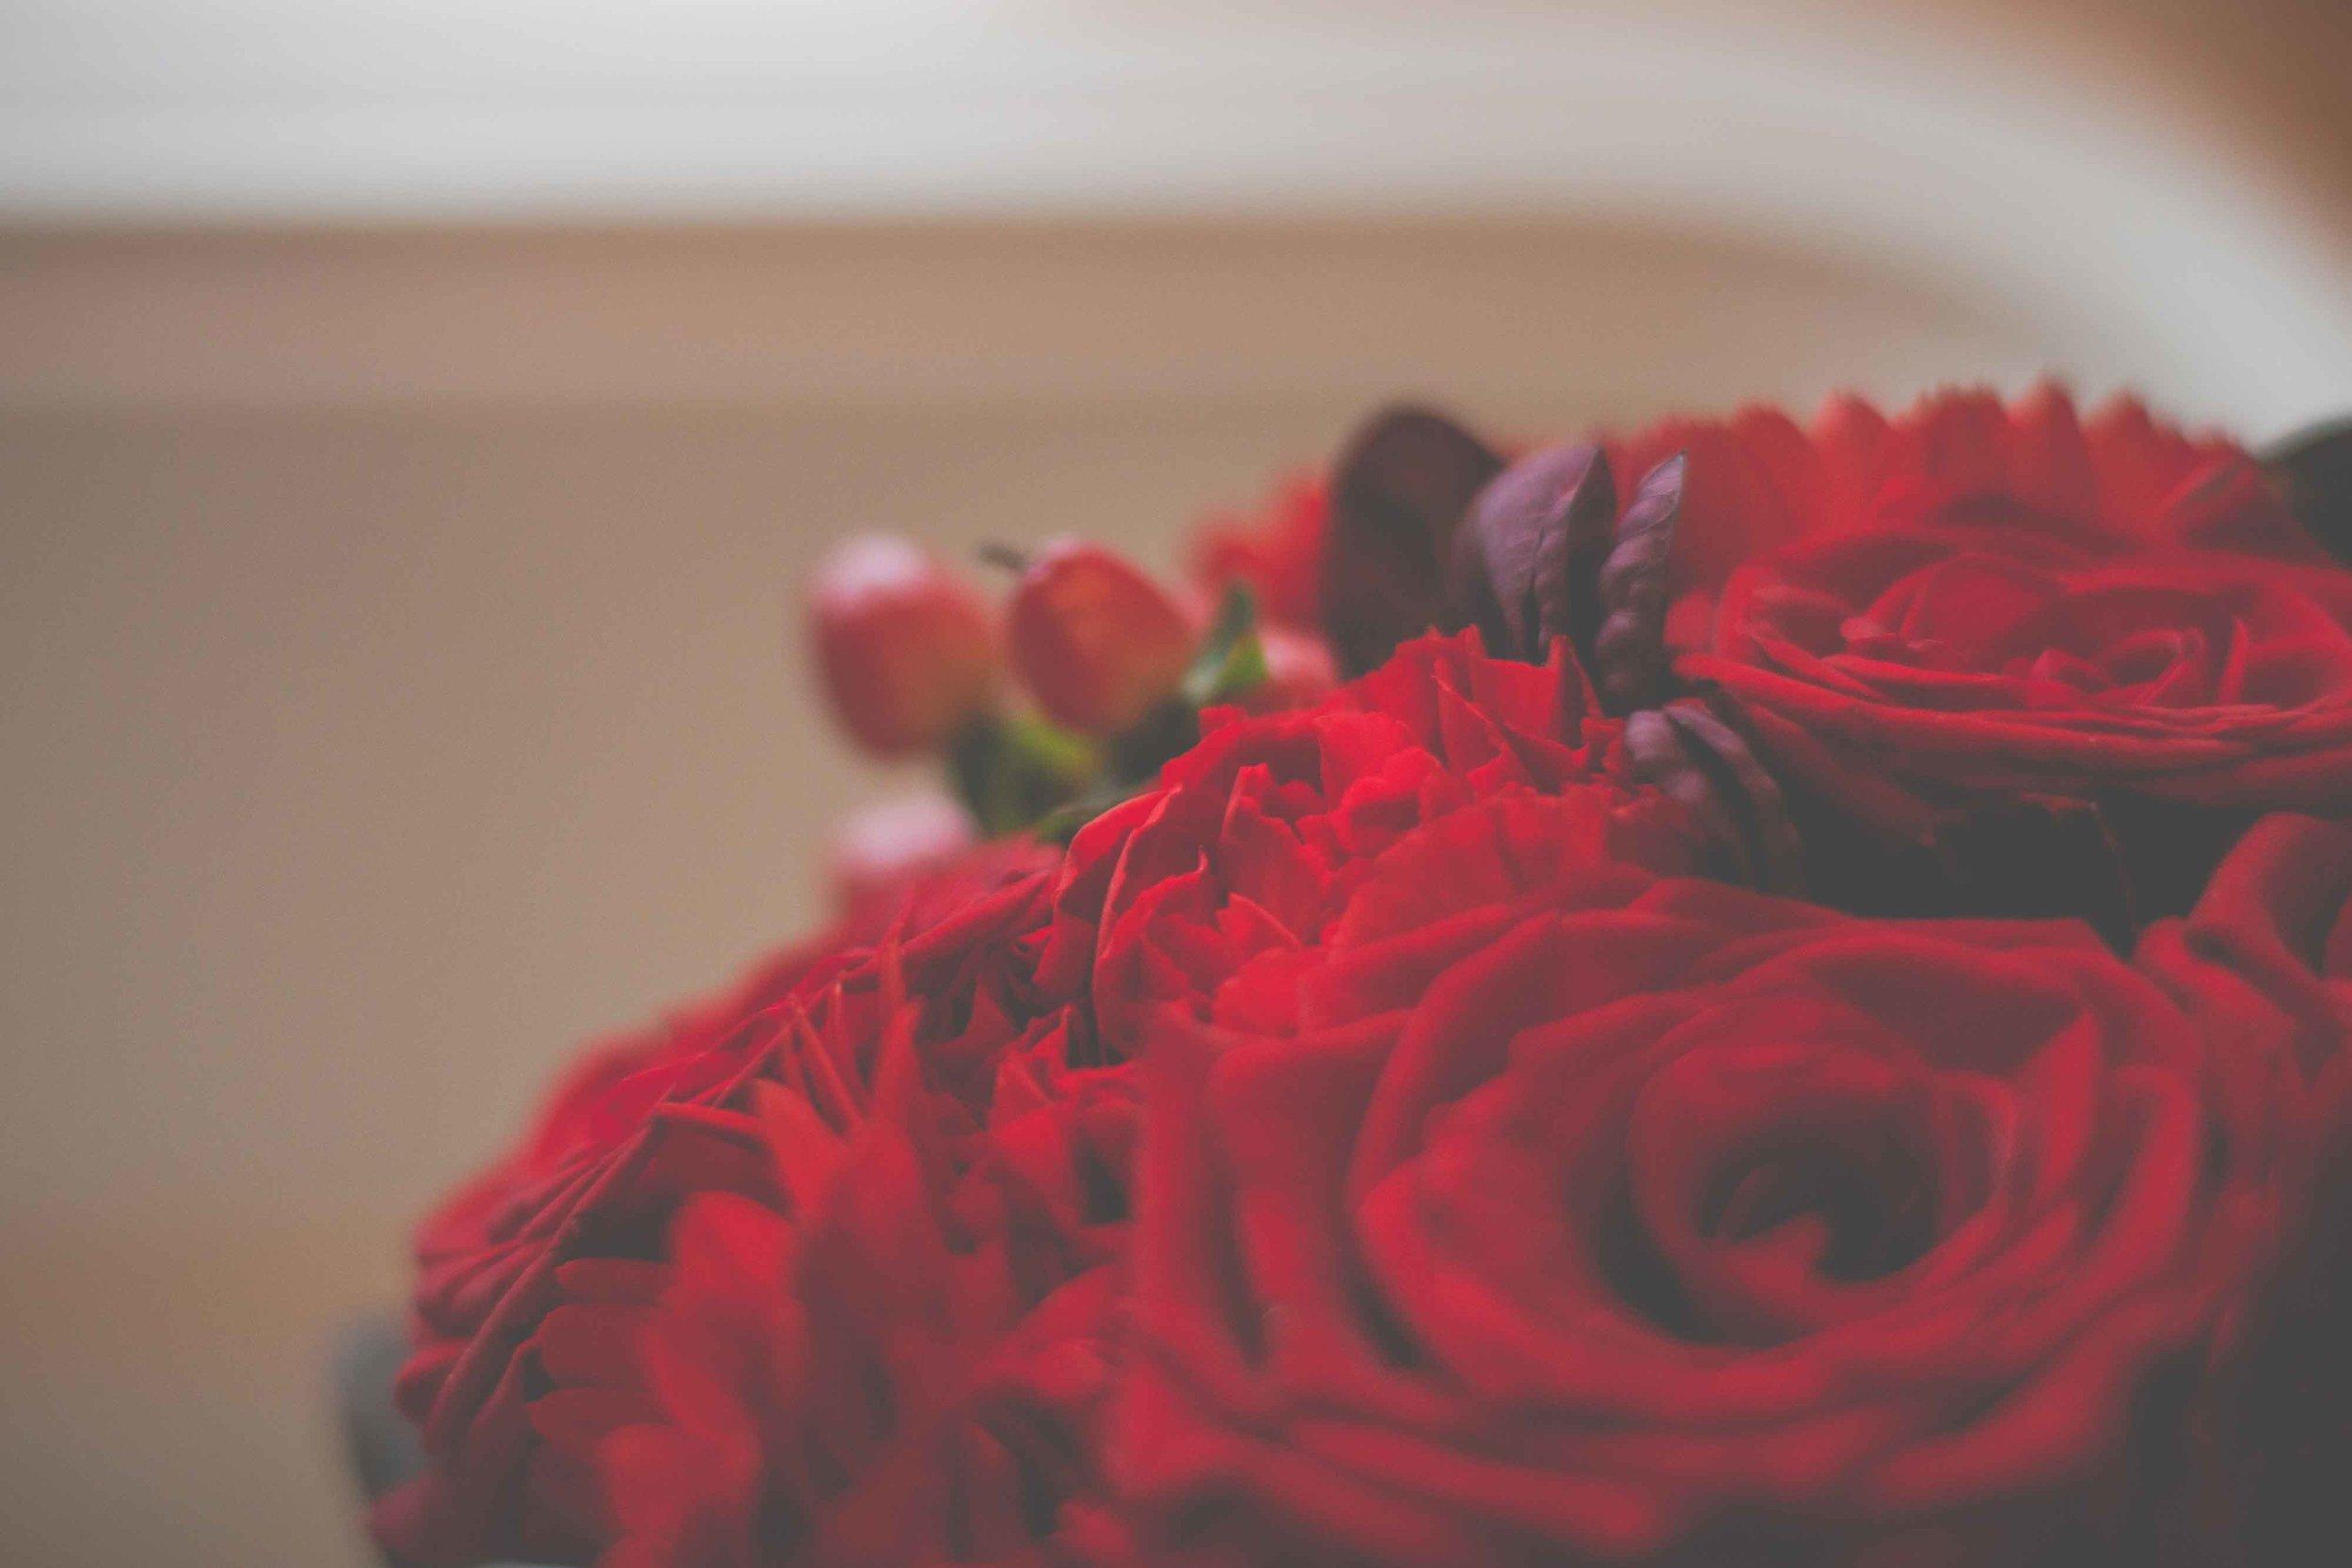 st-johns-ingrow-keighley-wedding-photos-03